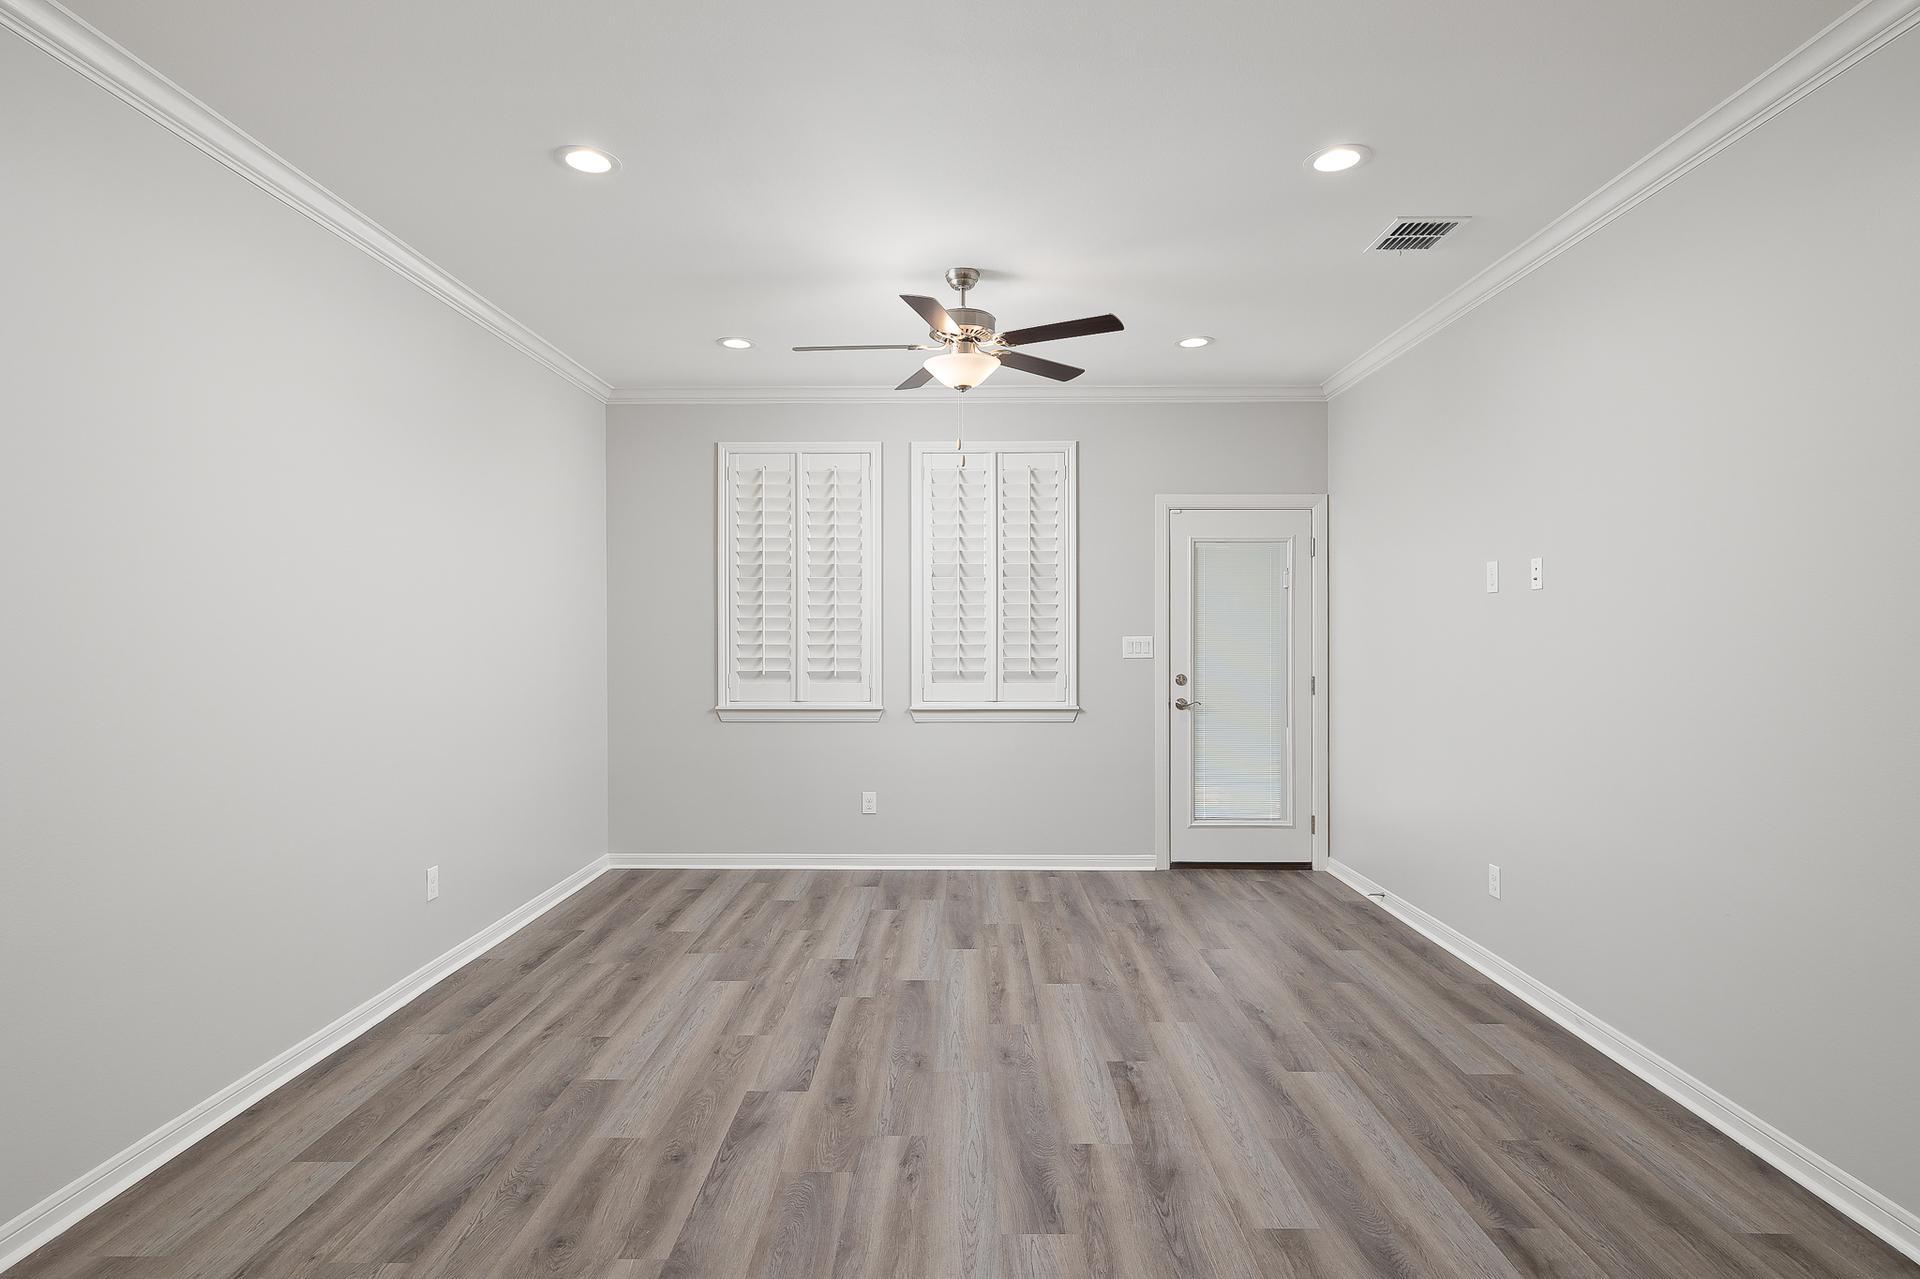 The Solano new home in Edinburg TX